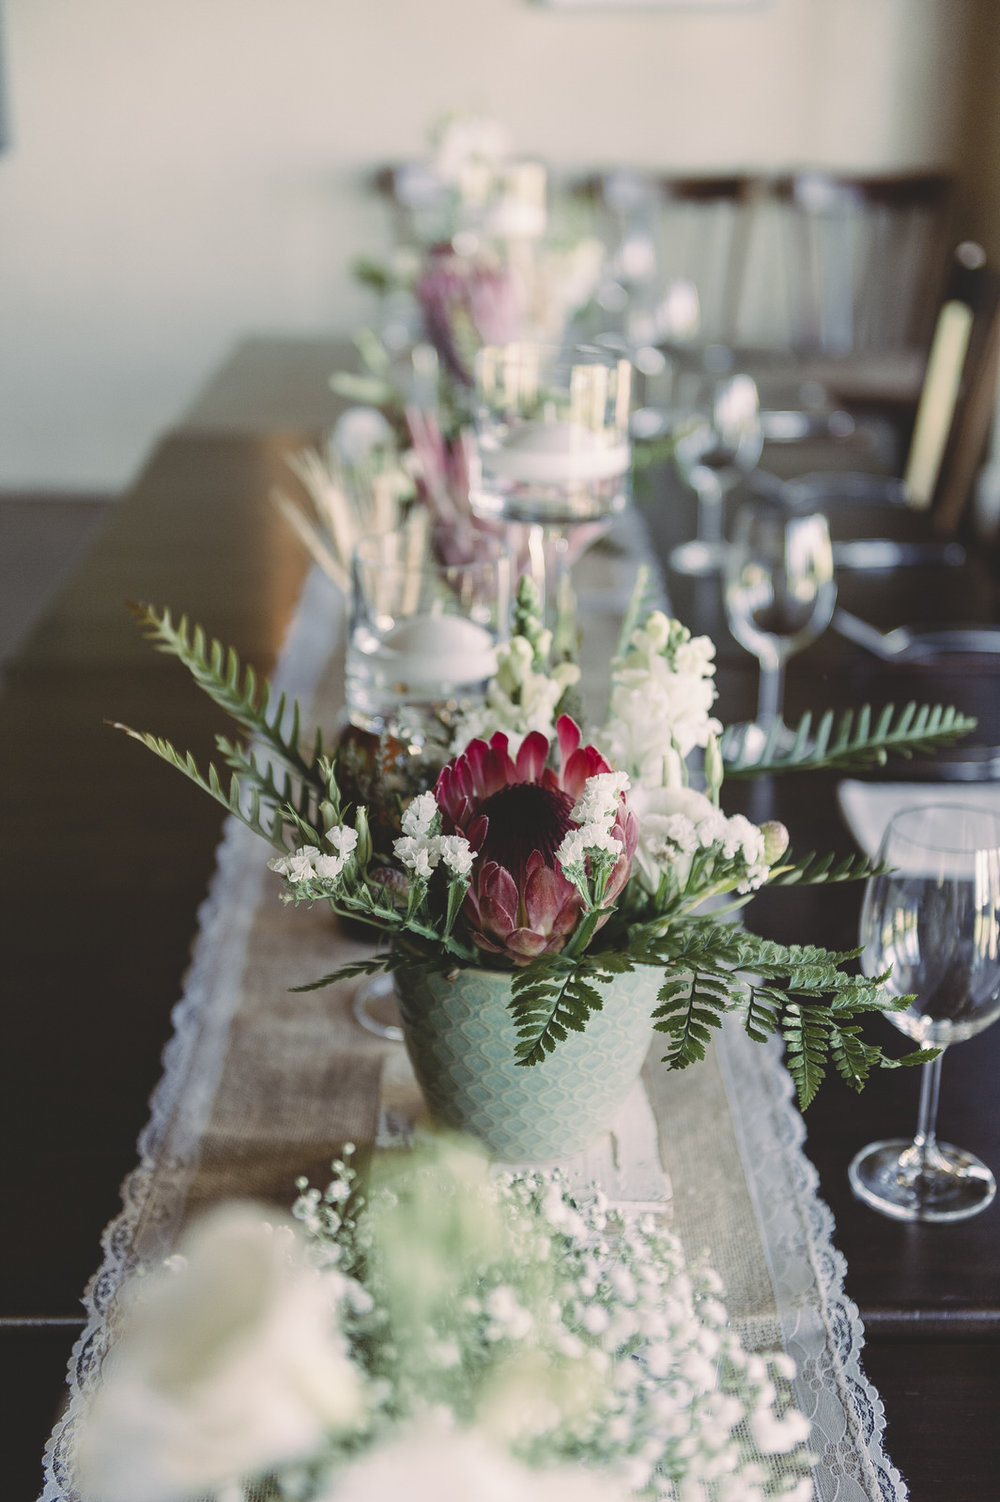 RyanParker_Wedding_CapeTown_Hermanus_GabrielsKloof_E+P_DSC_6252.jpg